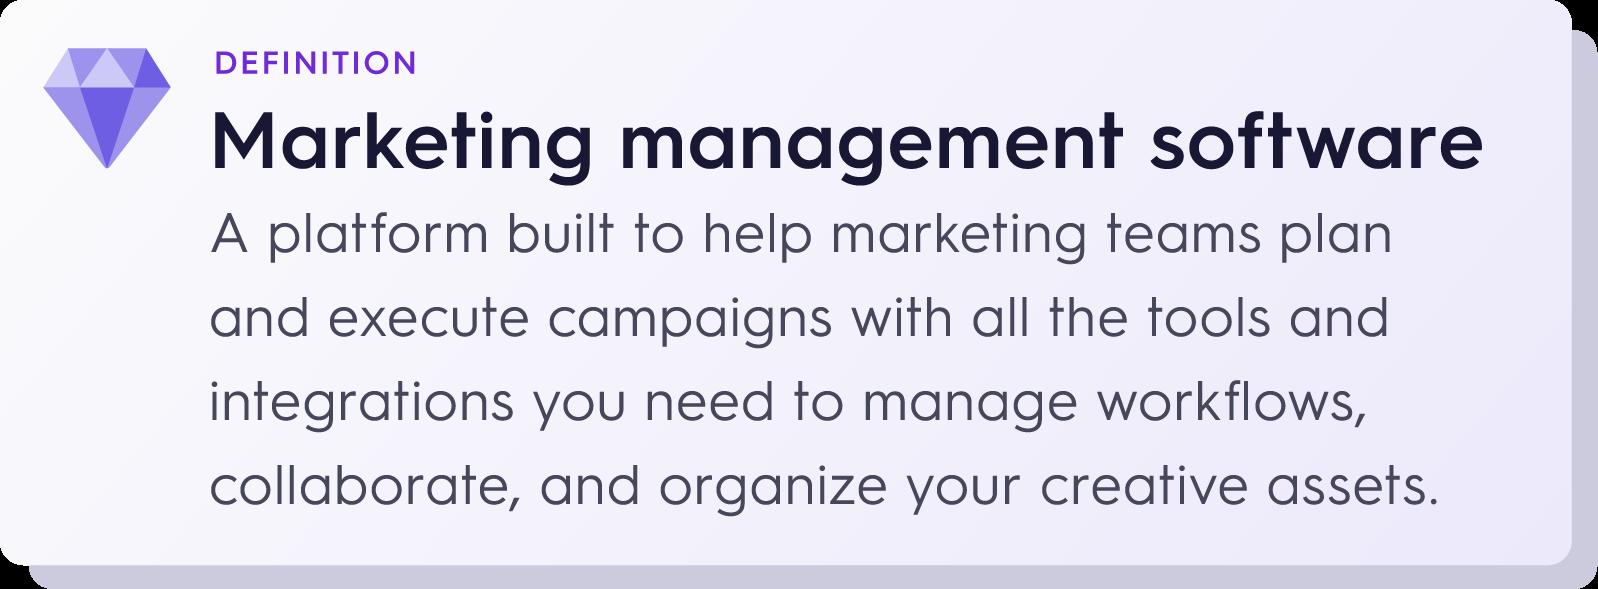 marketing management software definition.png